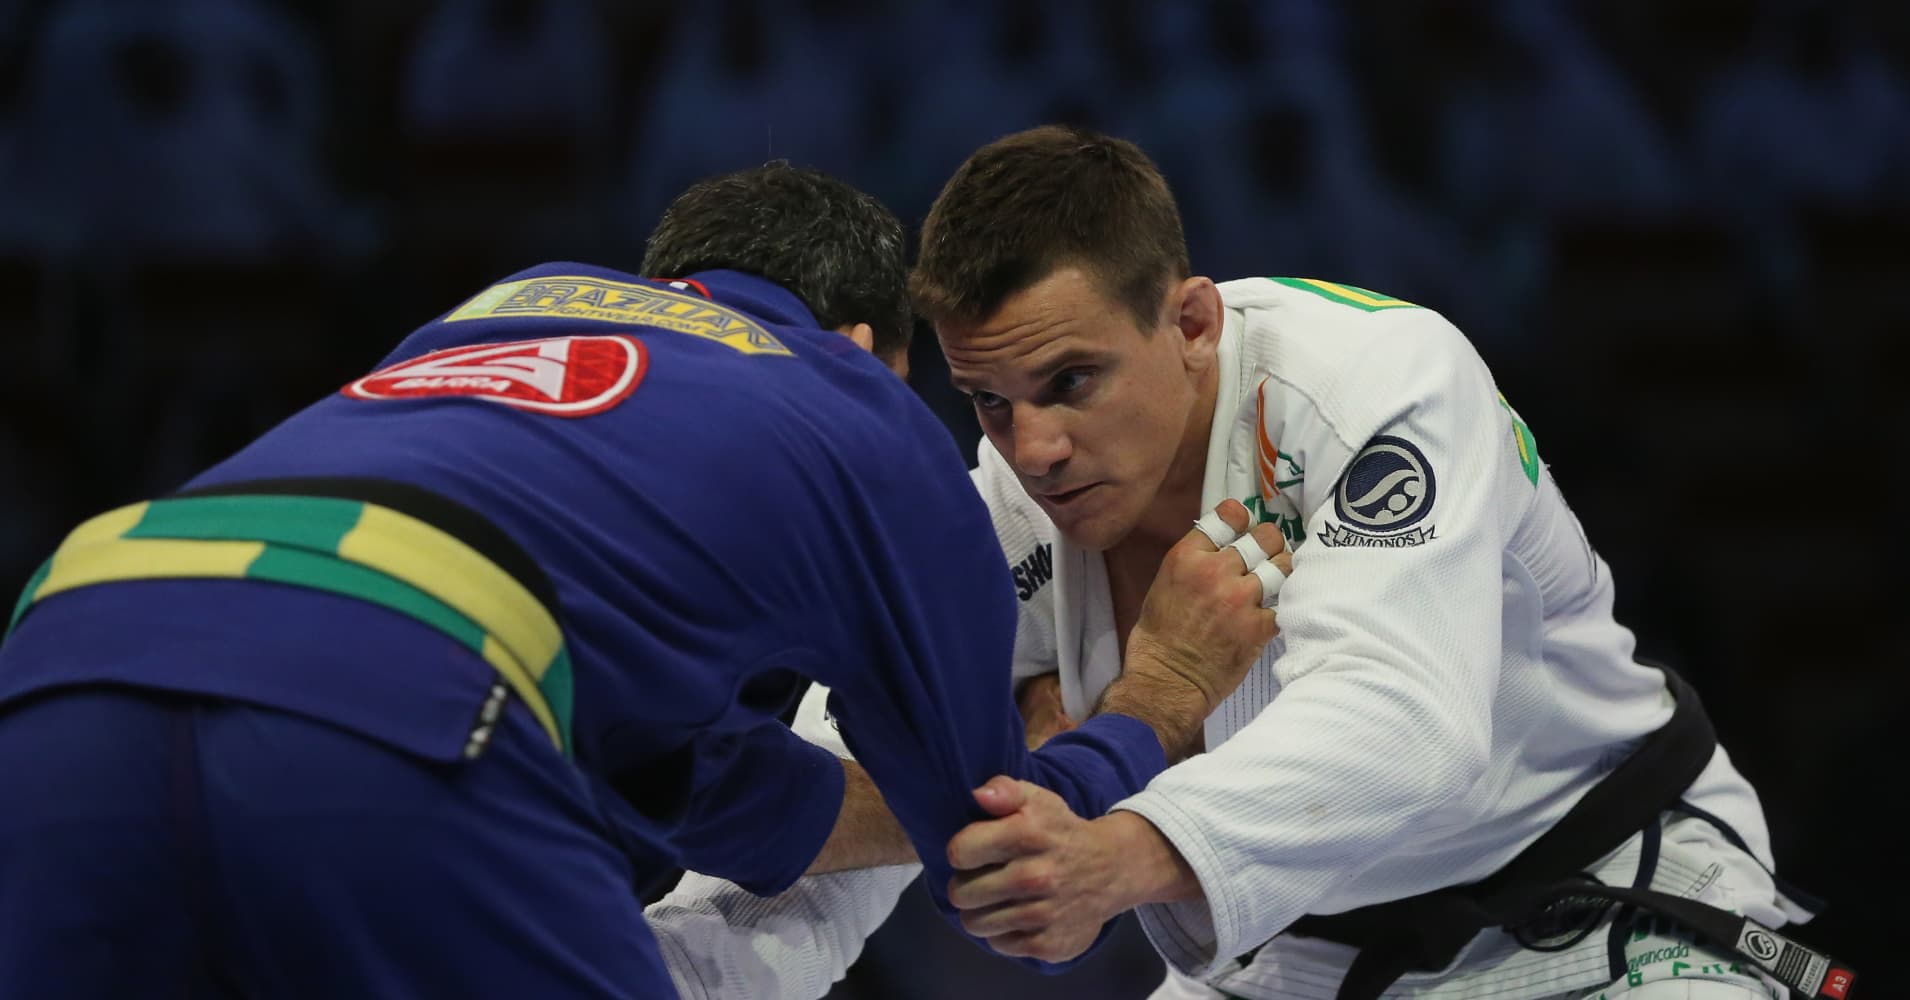 Ex-Navy SEAL commander: Here's why so many smart people practice jiu jitsu